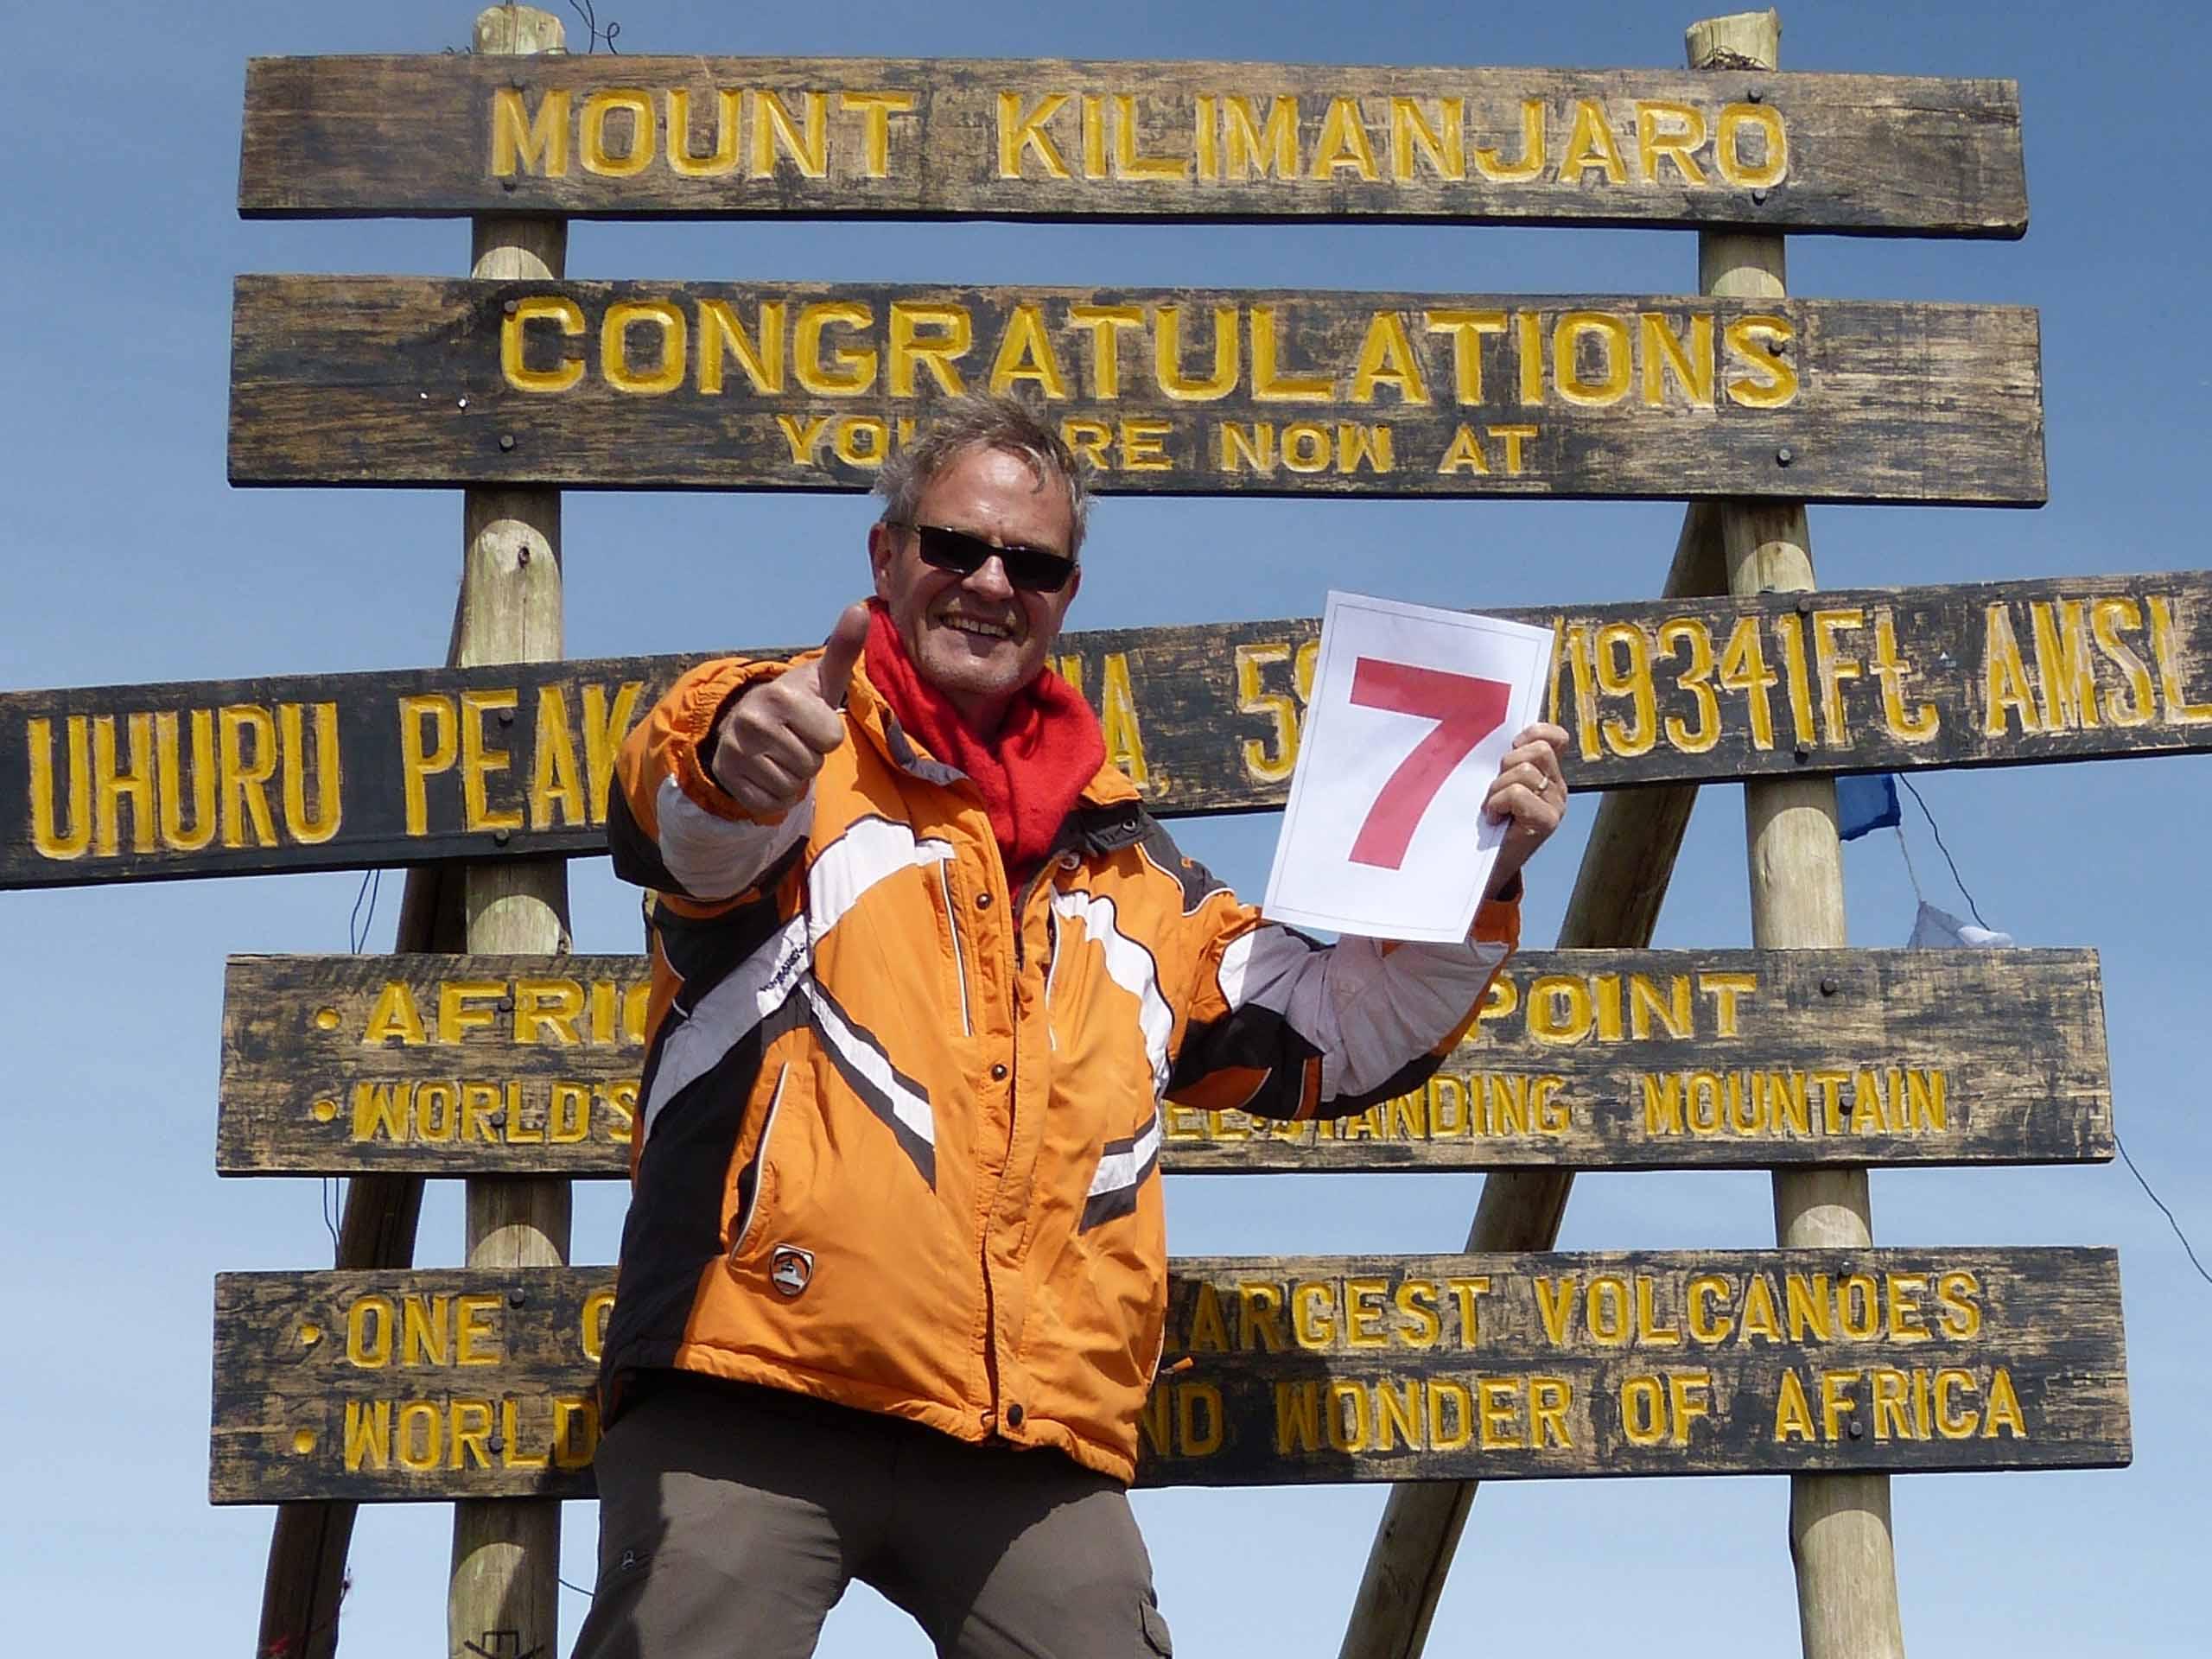 Martin's 7th climb